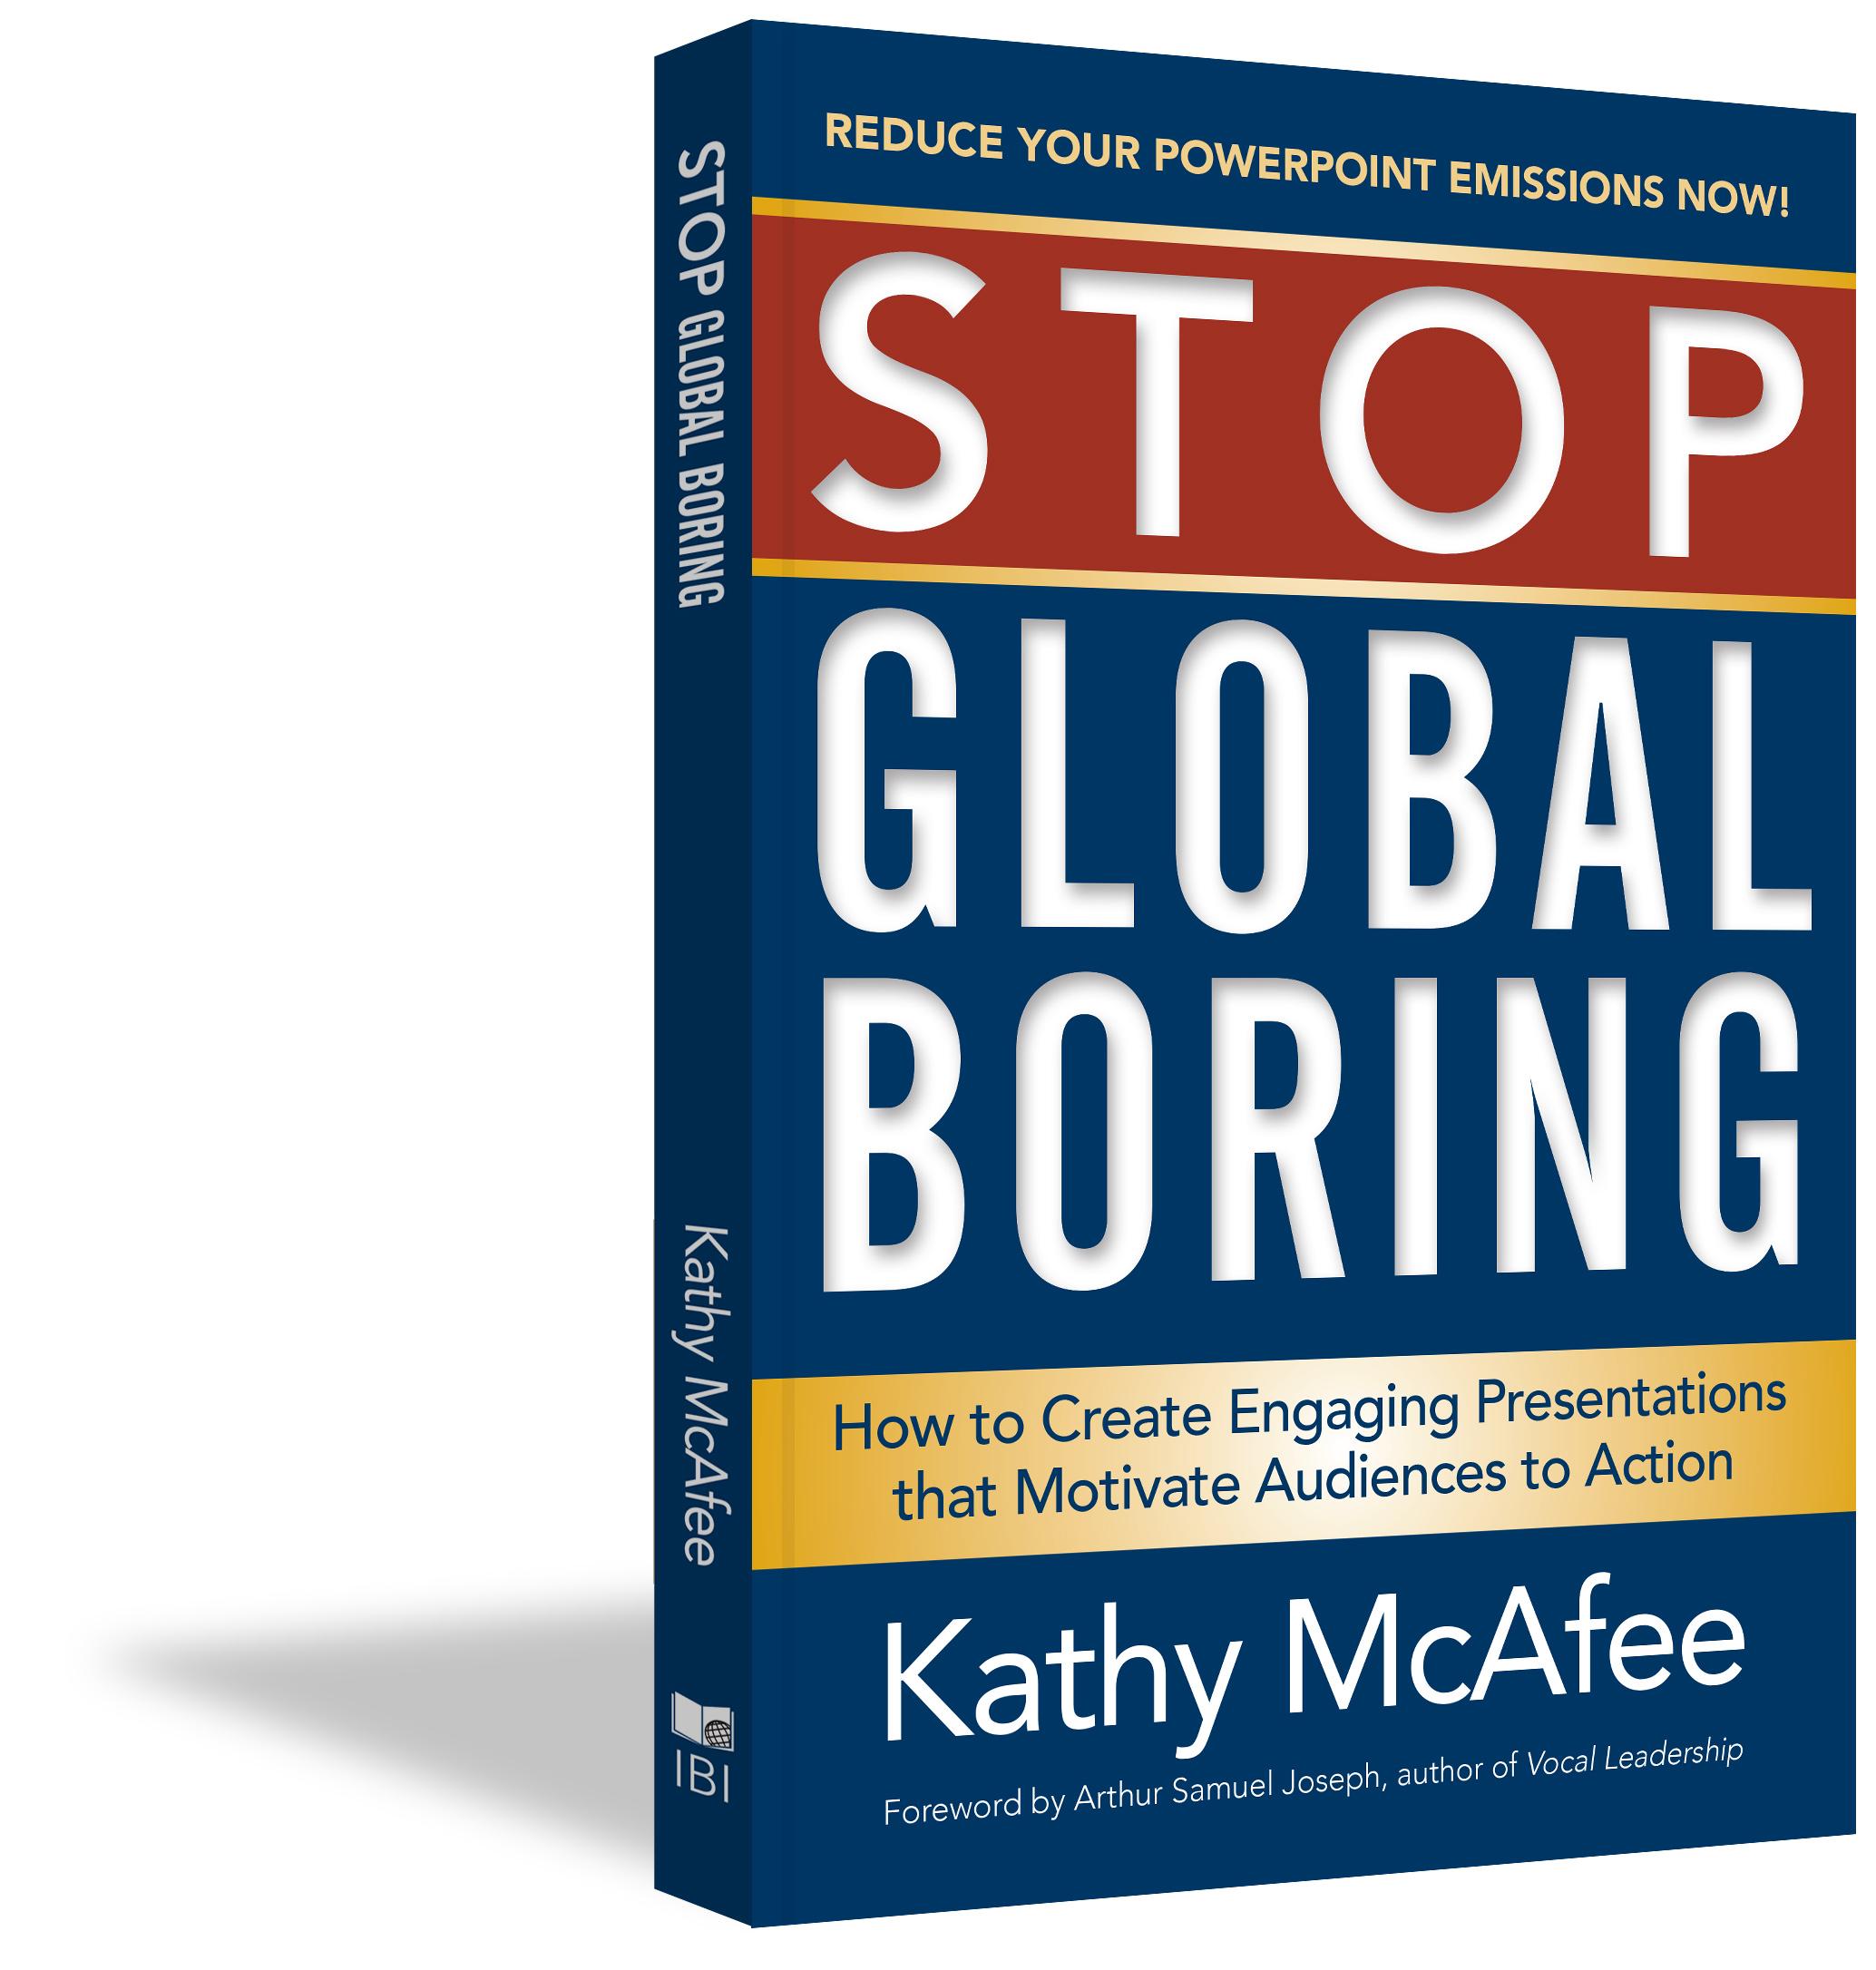 Stop Global Boring - Kathy McAfee